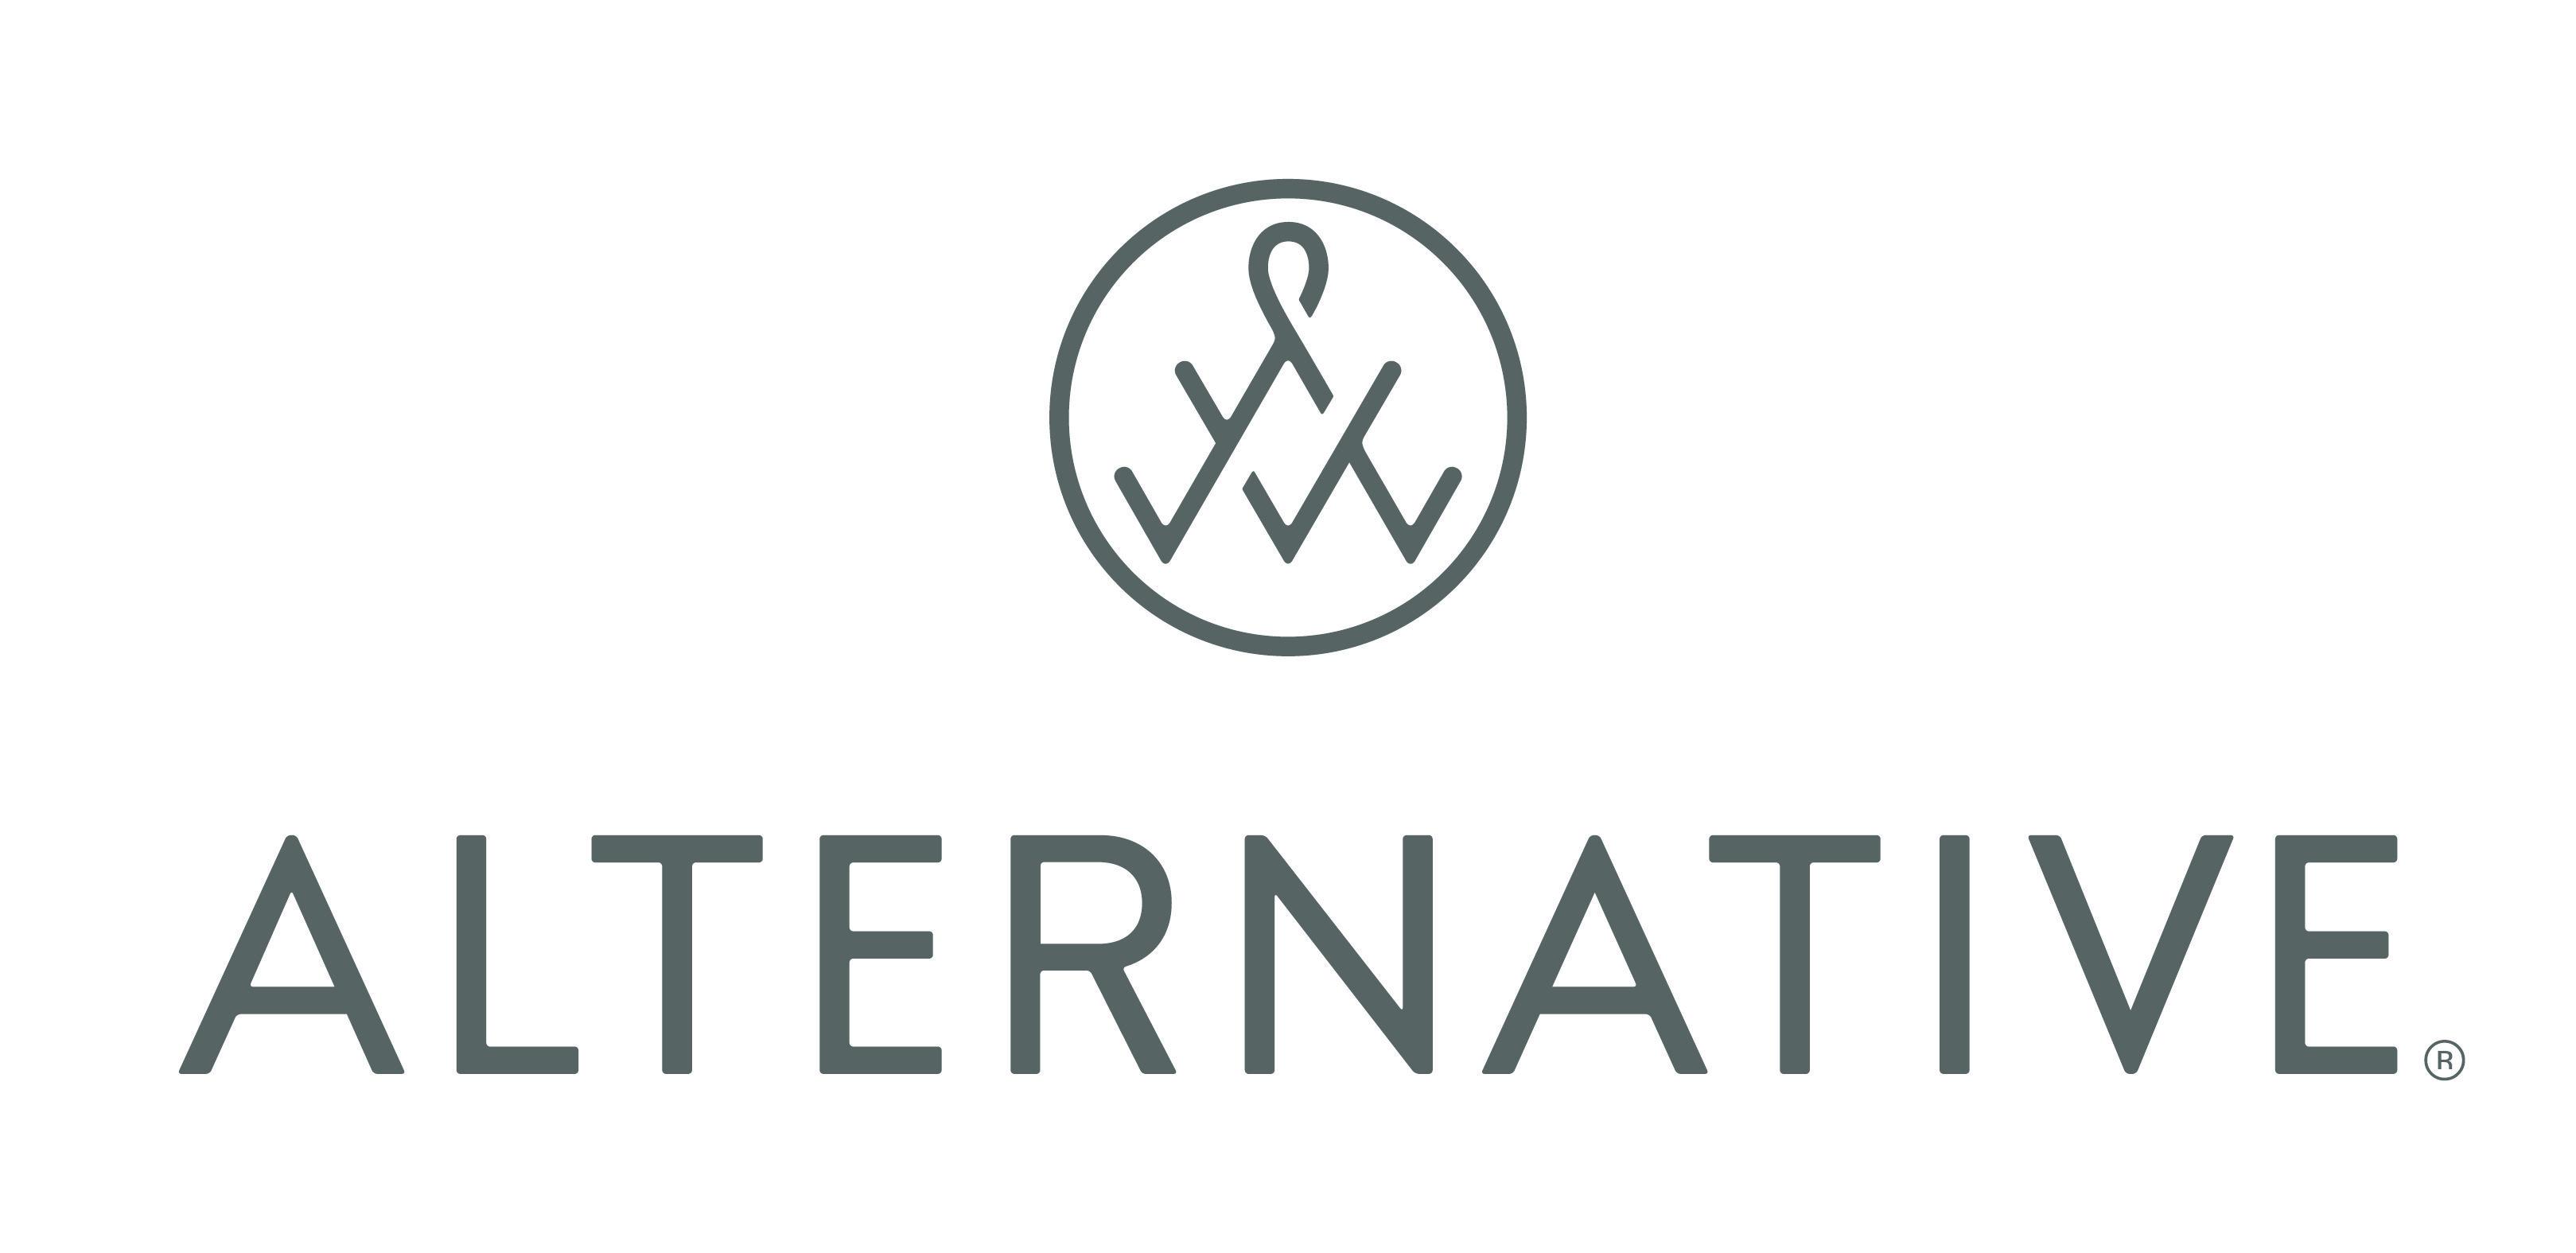 Alternative Apparel Alternative outfits, Clothing logo